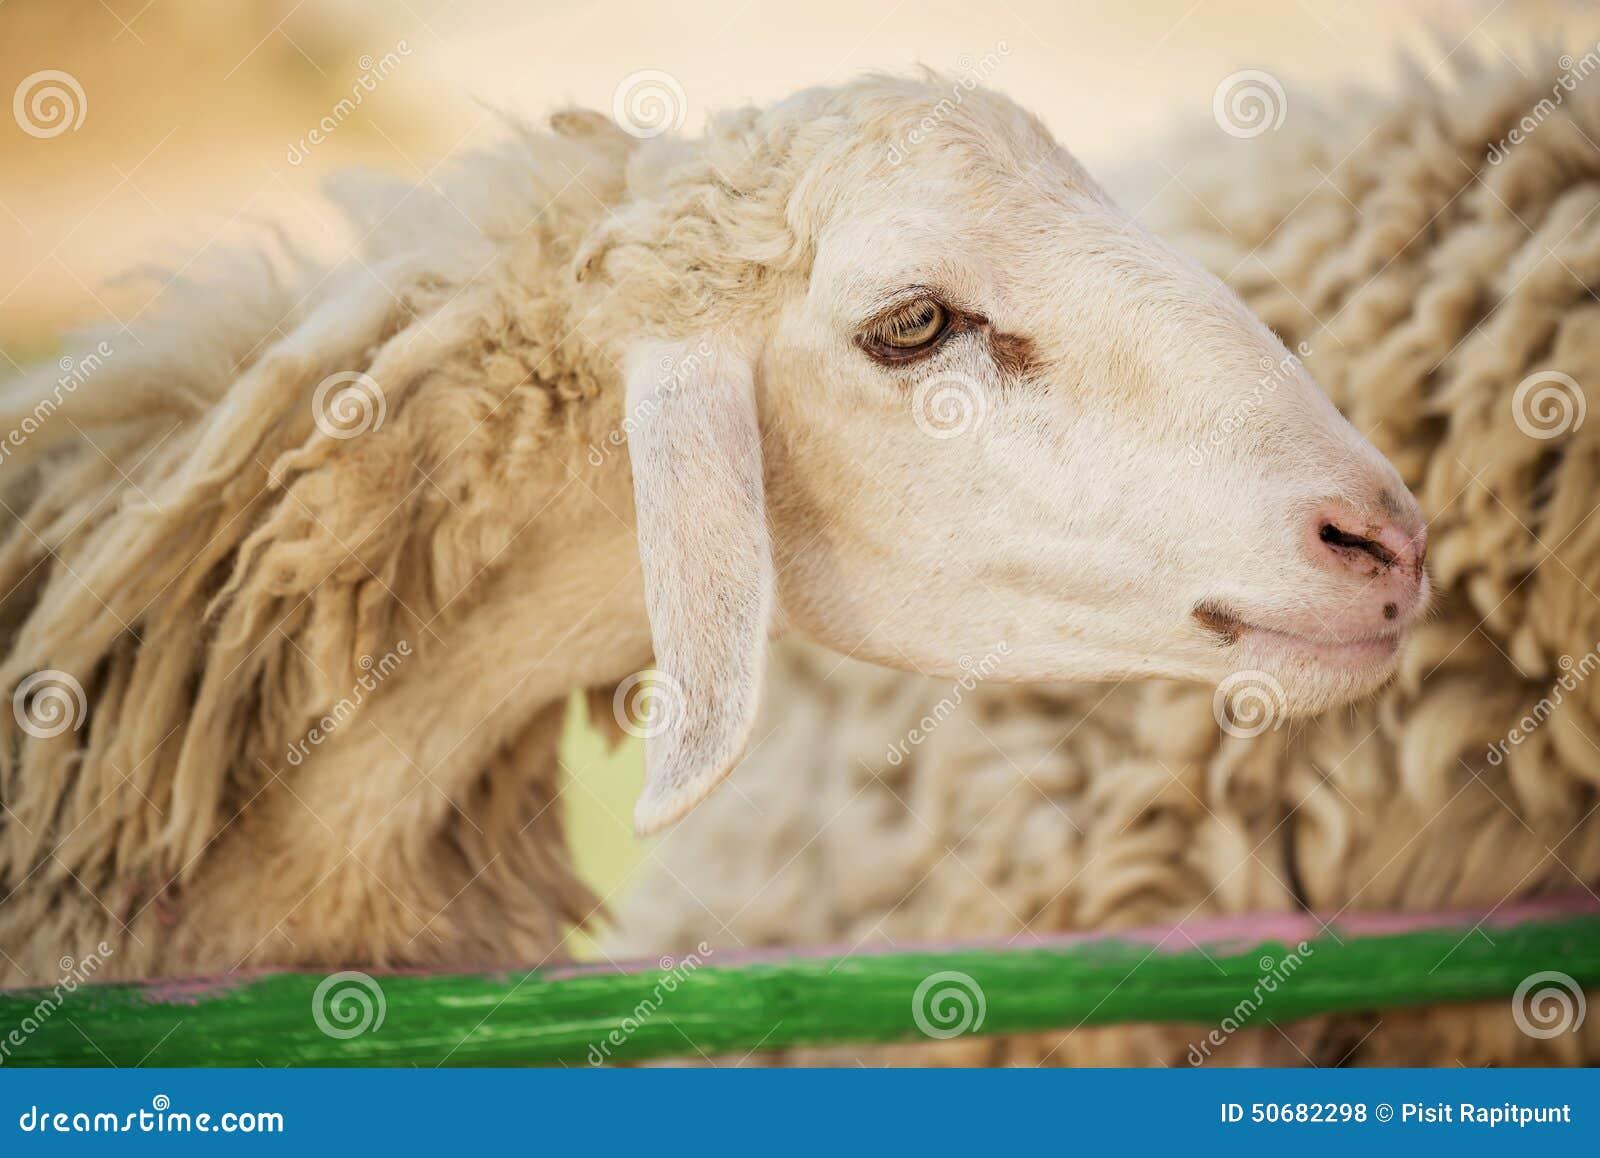 Download 在农场哄骗哺养的绵羊,泰国 库存照片. 图片 包括有 地产, 旅行, 空白, 愉快, 的treadled - 50682298